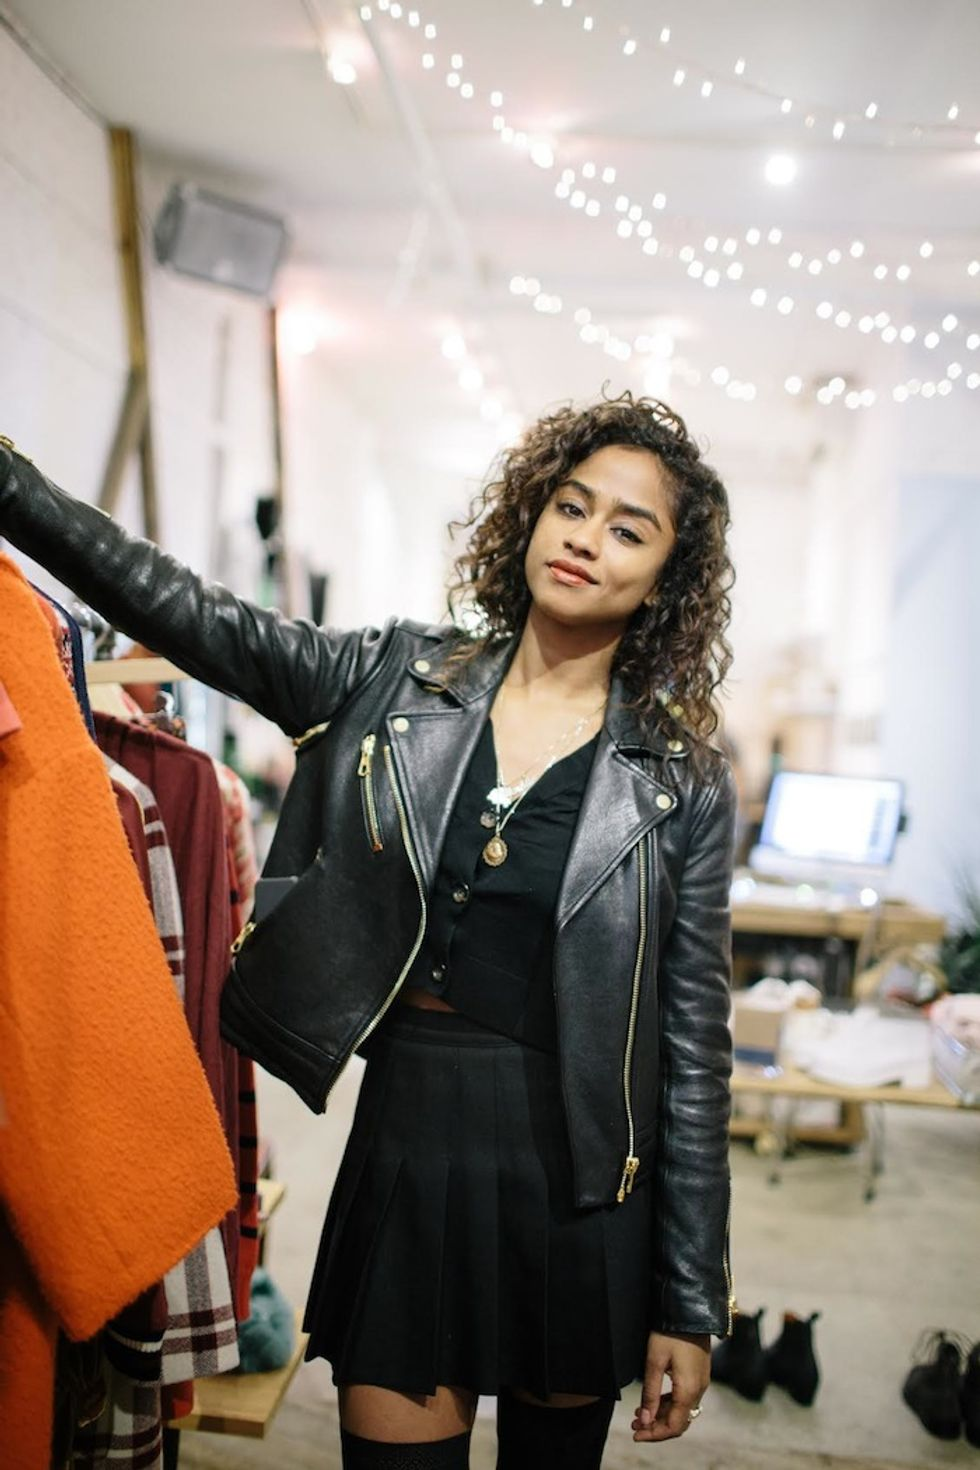 Filmmaker, Designer and Party Maven Vashtie Kola on NYC's 5 Coolest Small Shops